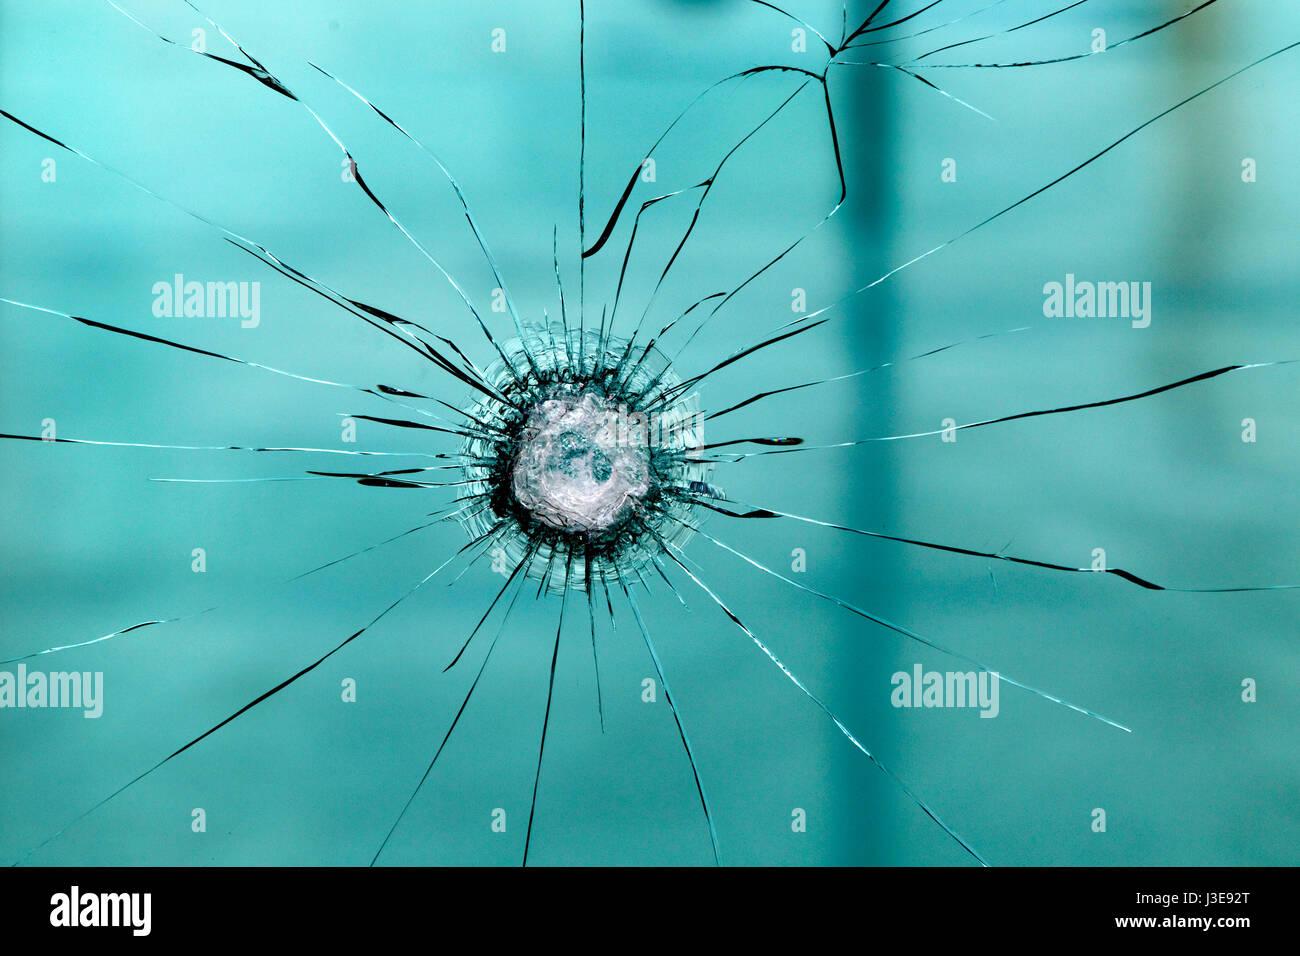 Broken glass window pane - Stock Image